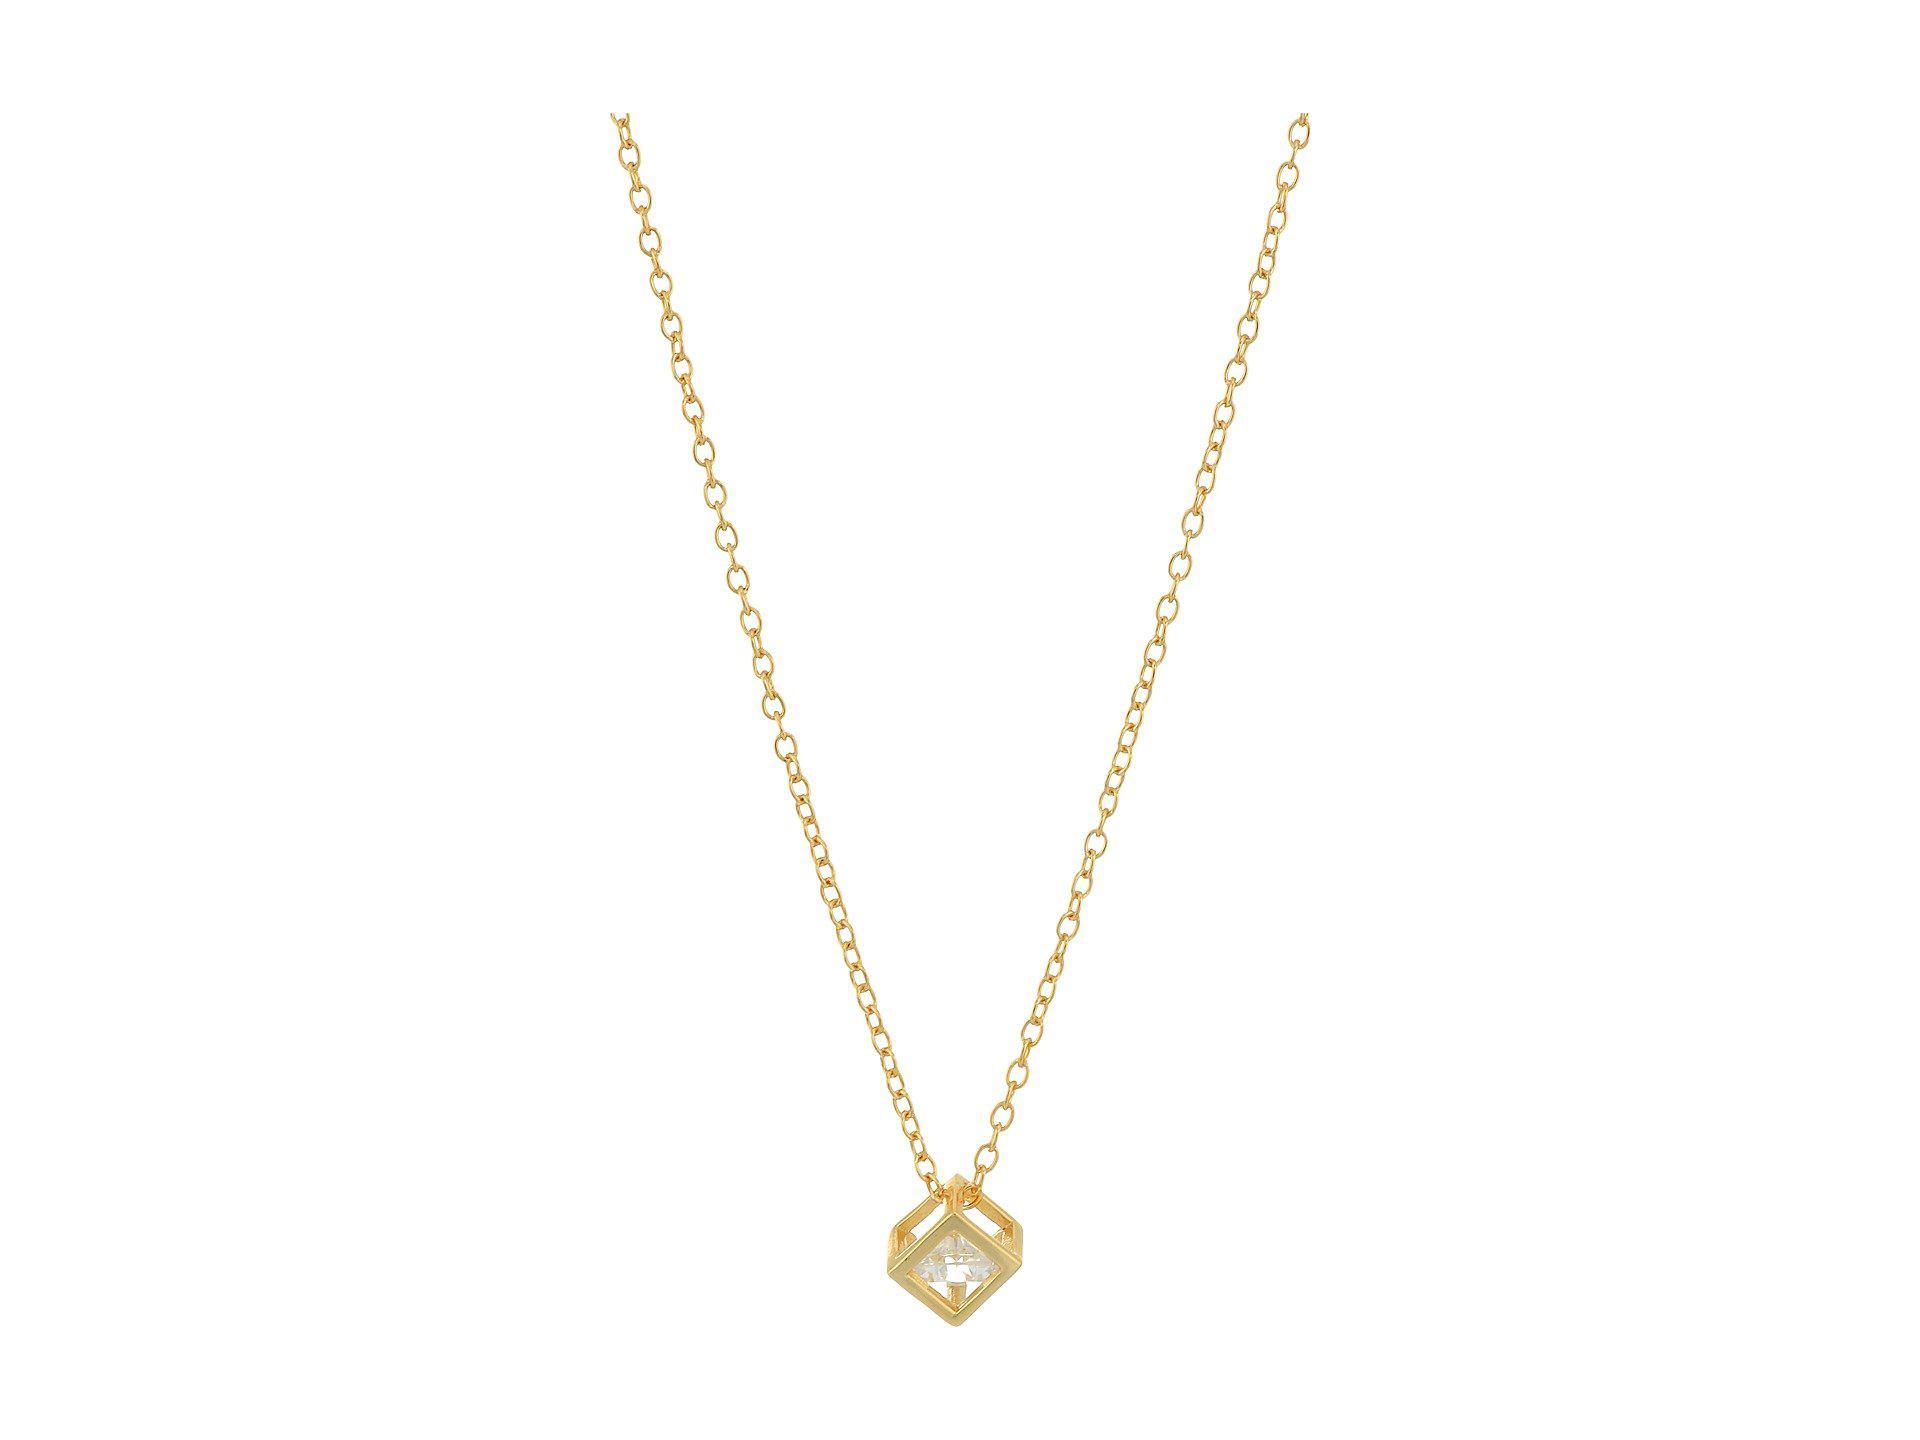 Rosa Collar De Oro Metálico En Shashi 8FGo7W0